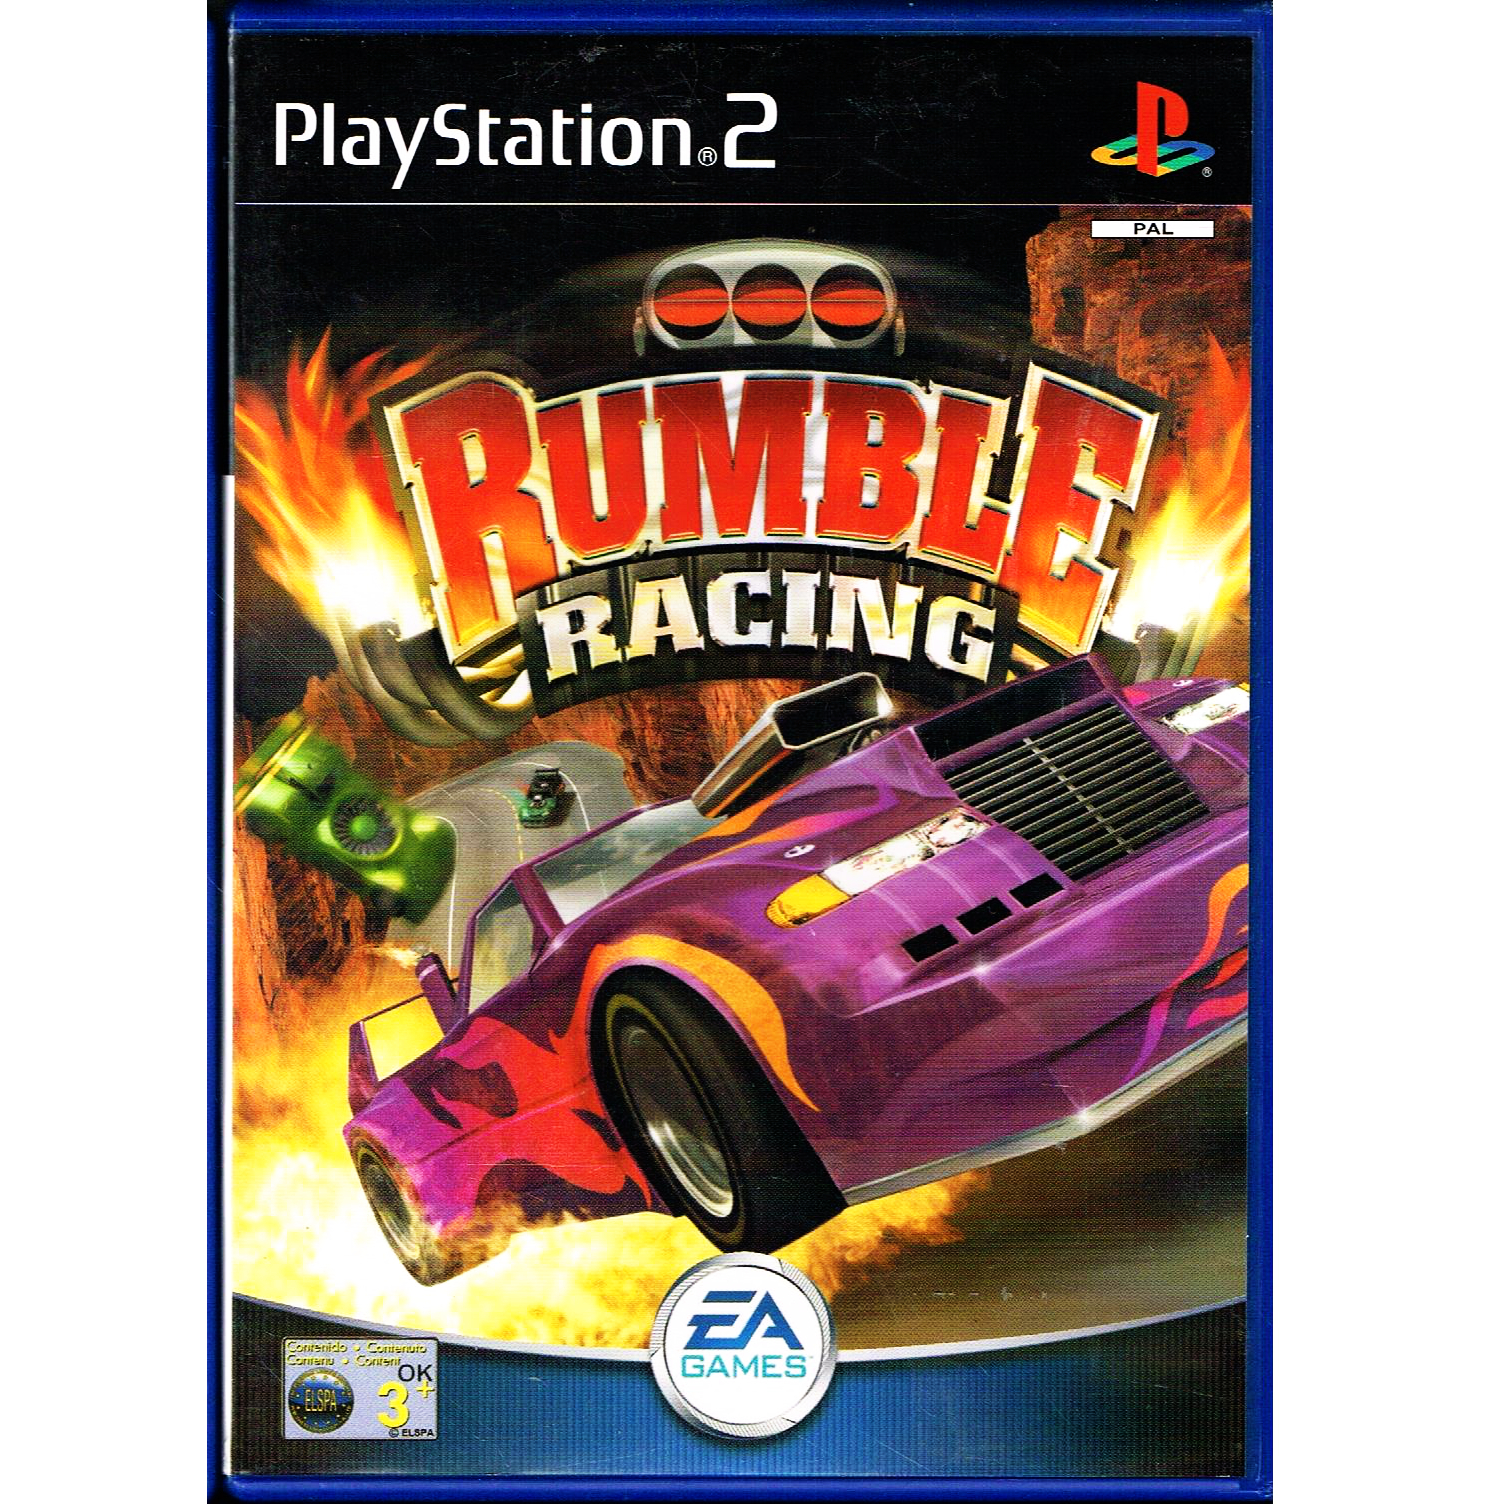 rumble racing ps2